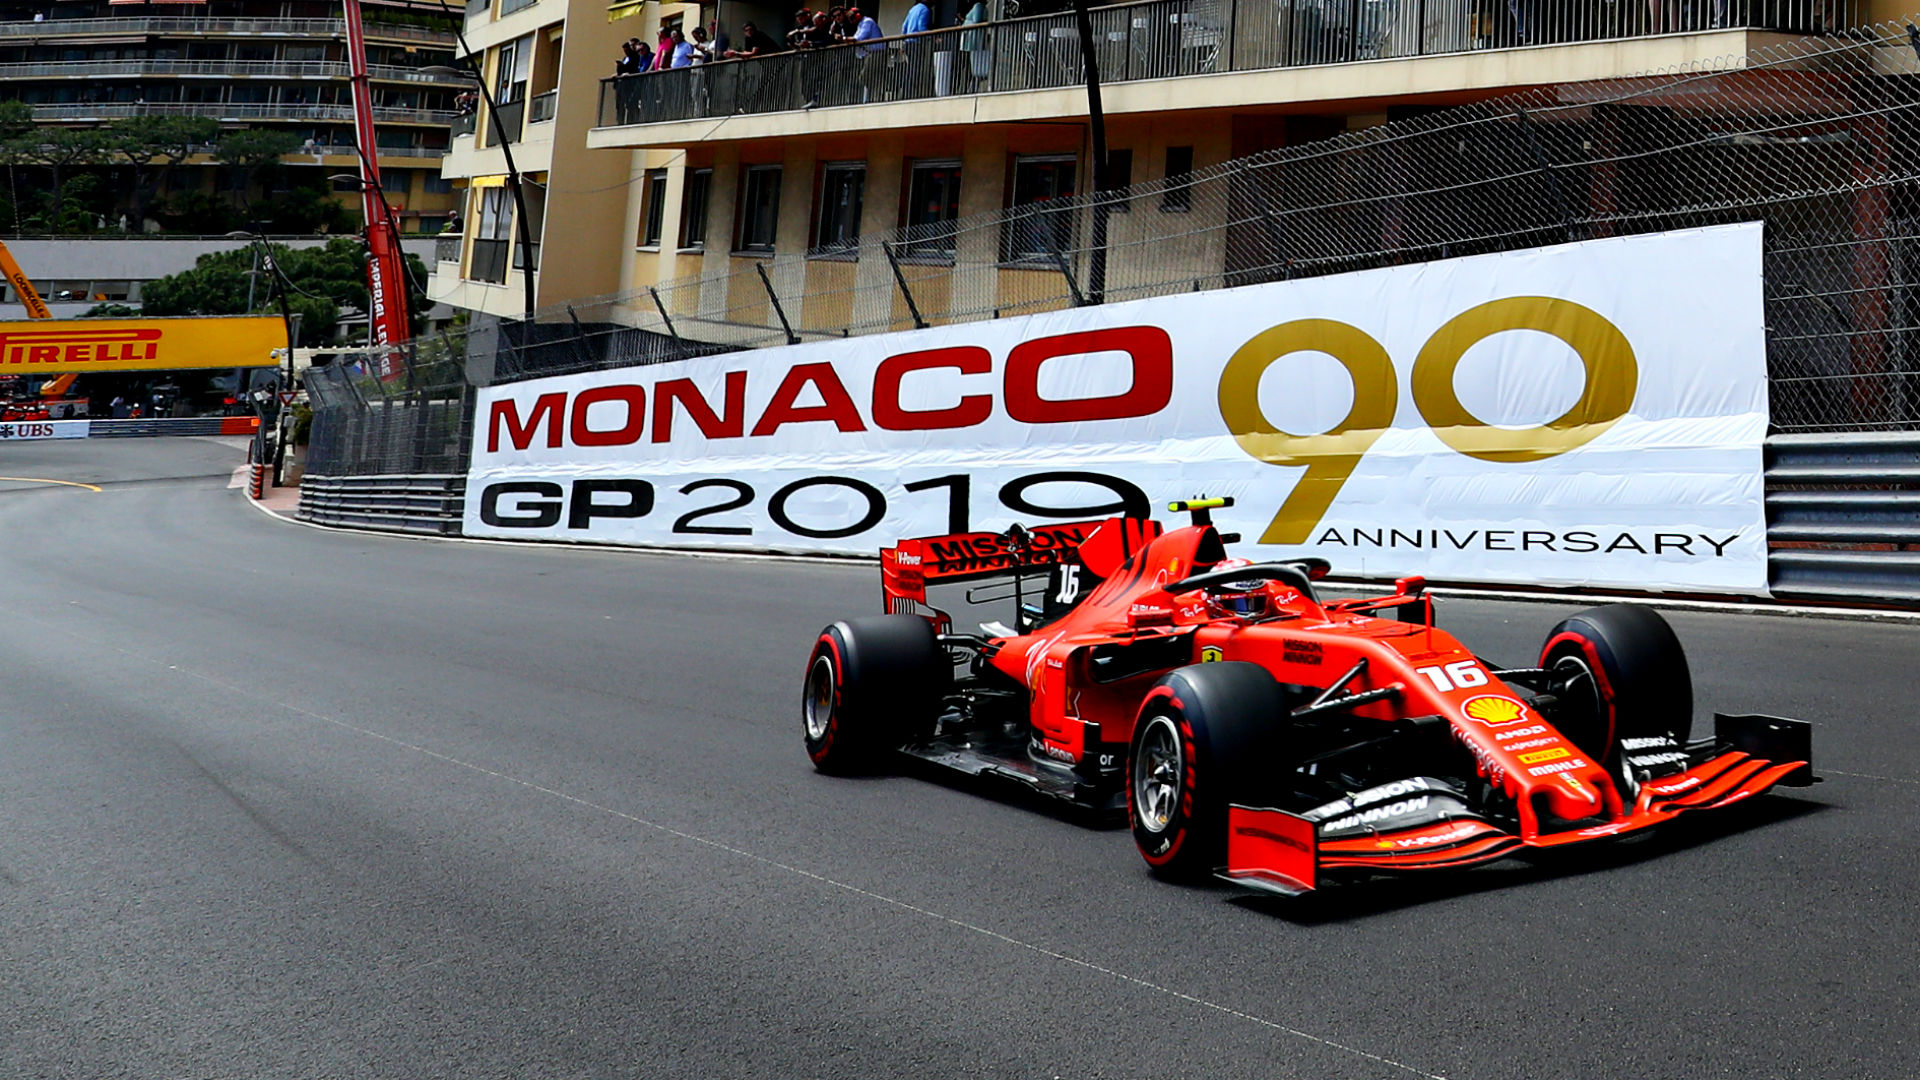 formula 1 monaco 2018 live stream free